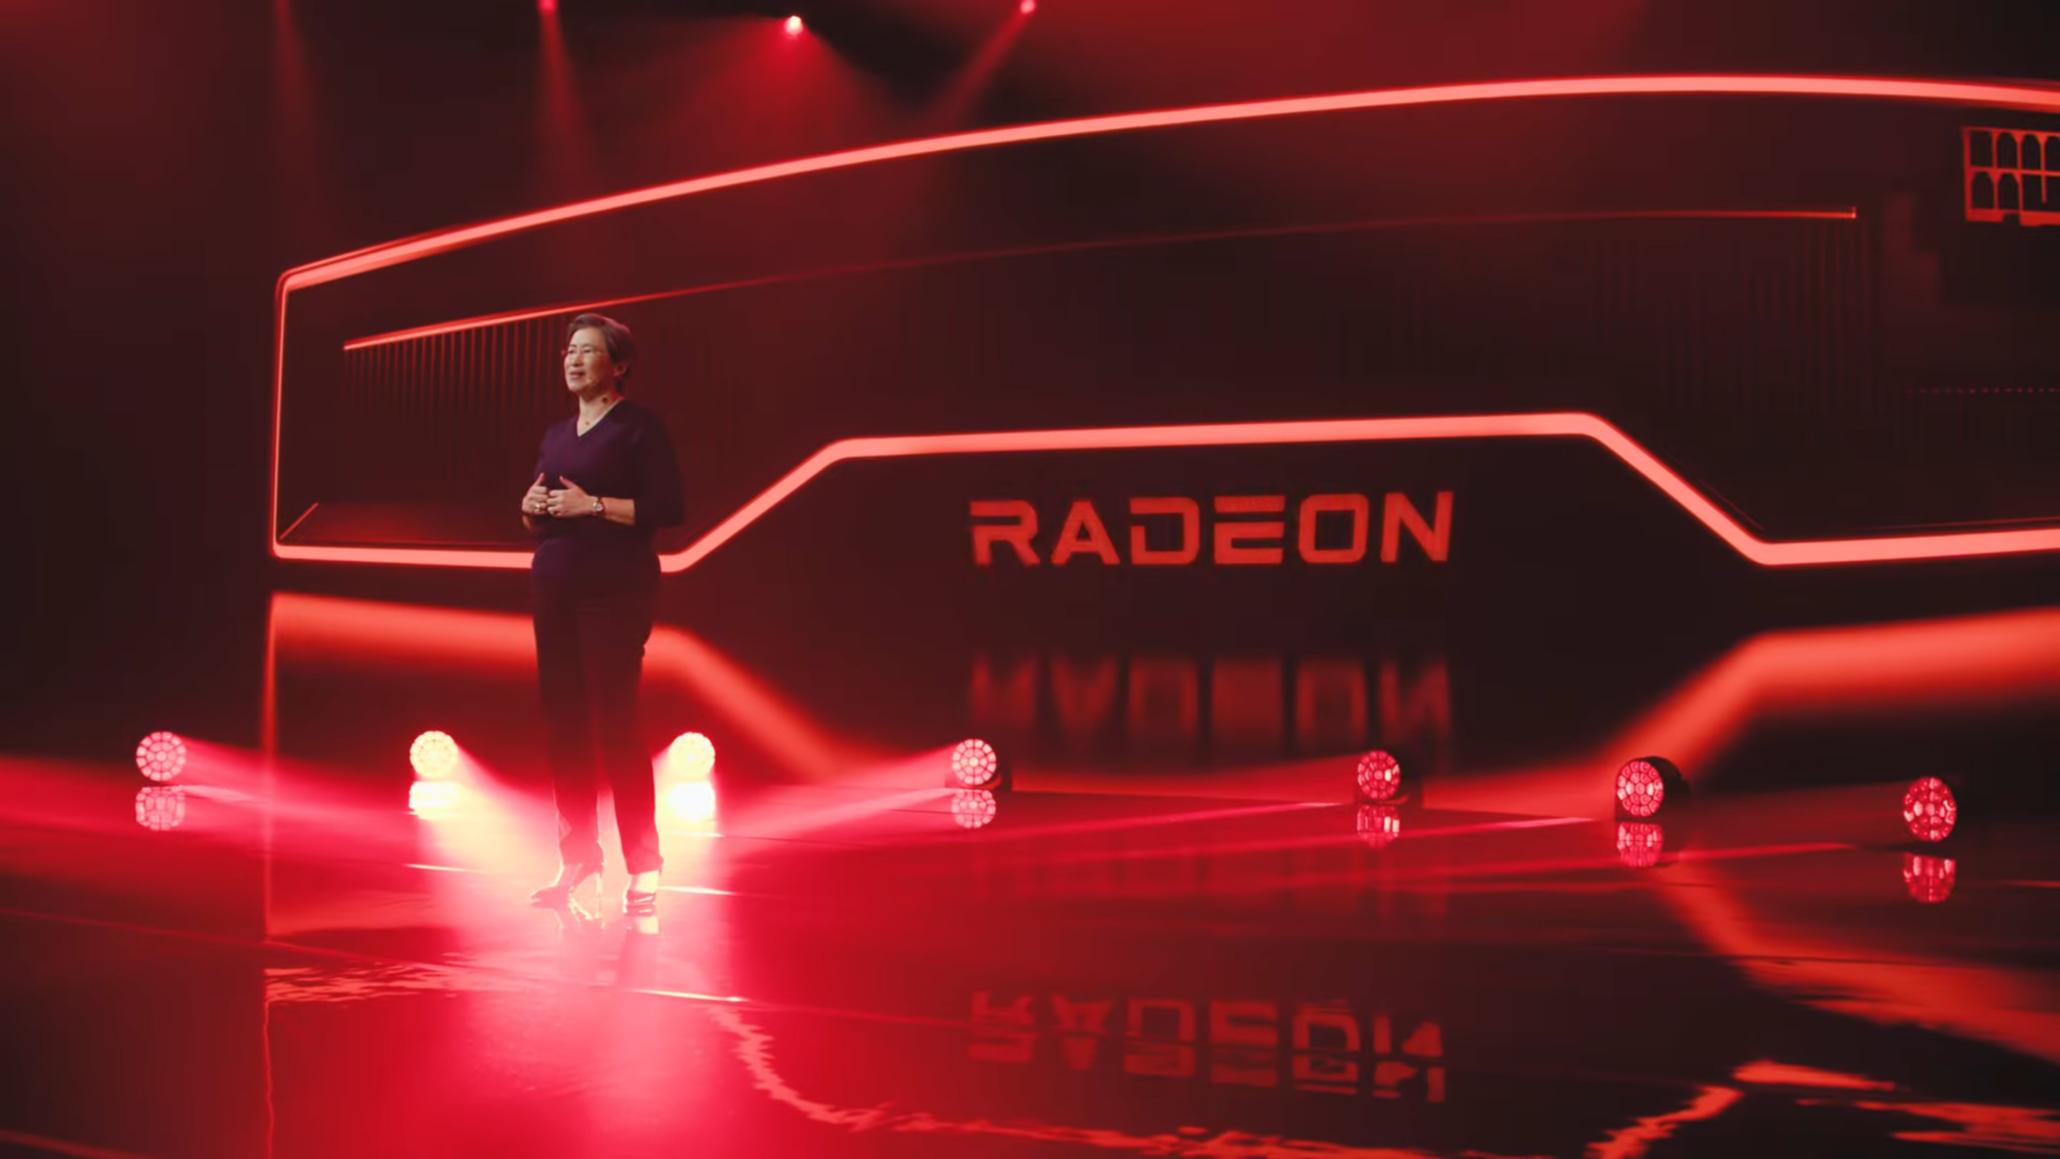 AMD Radeon RX 6000 Navi 21 XT Navi 21 XL